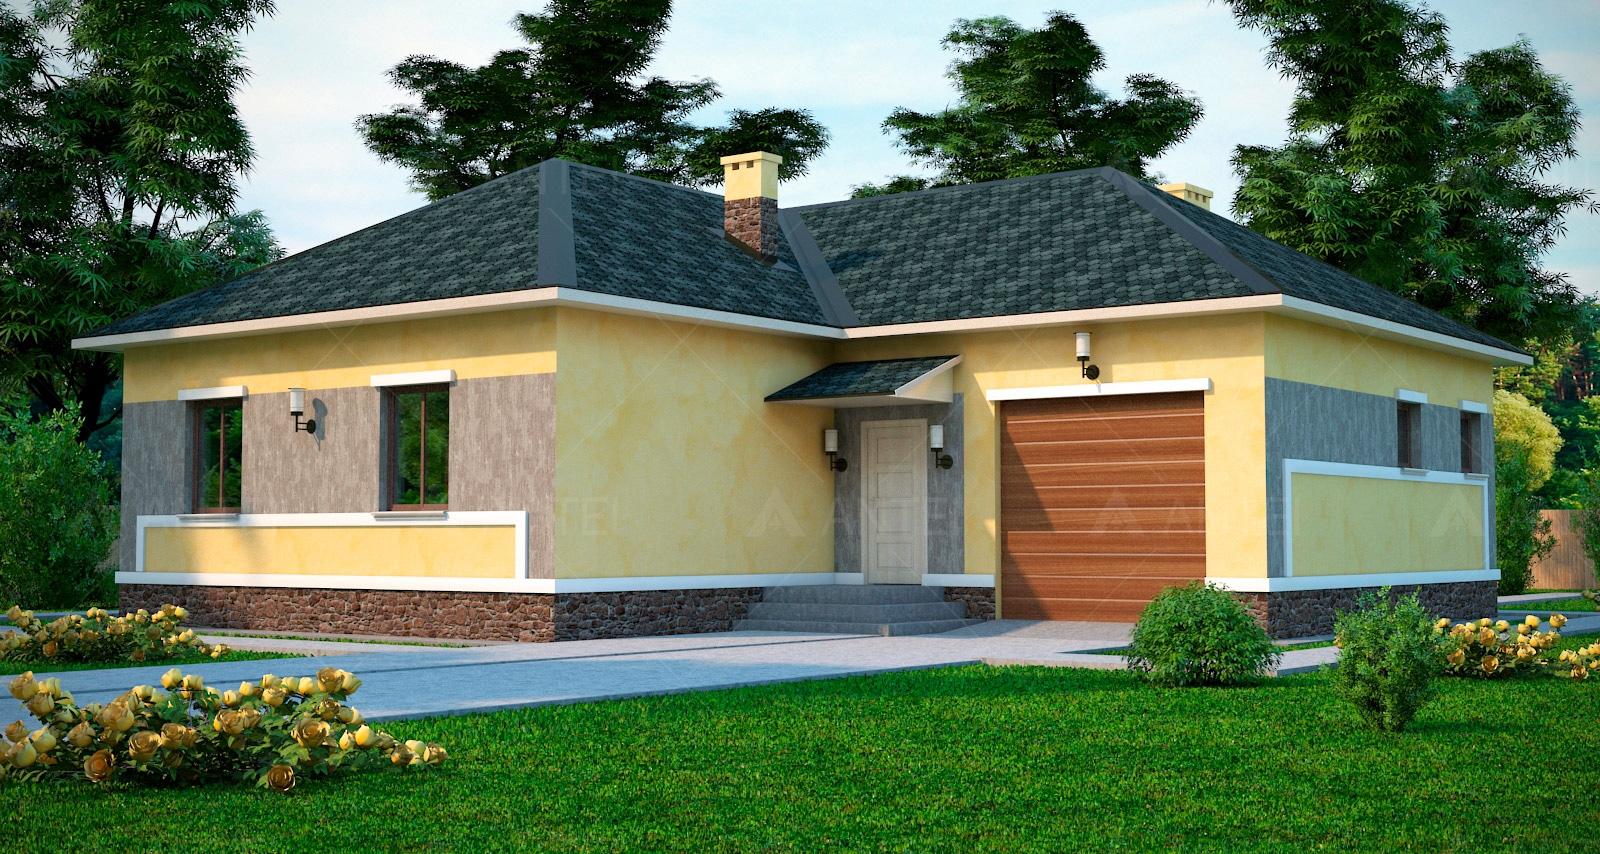 Проект одноэтажного дома с гаражом «КО-45» - фото №1